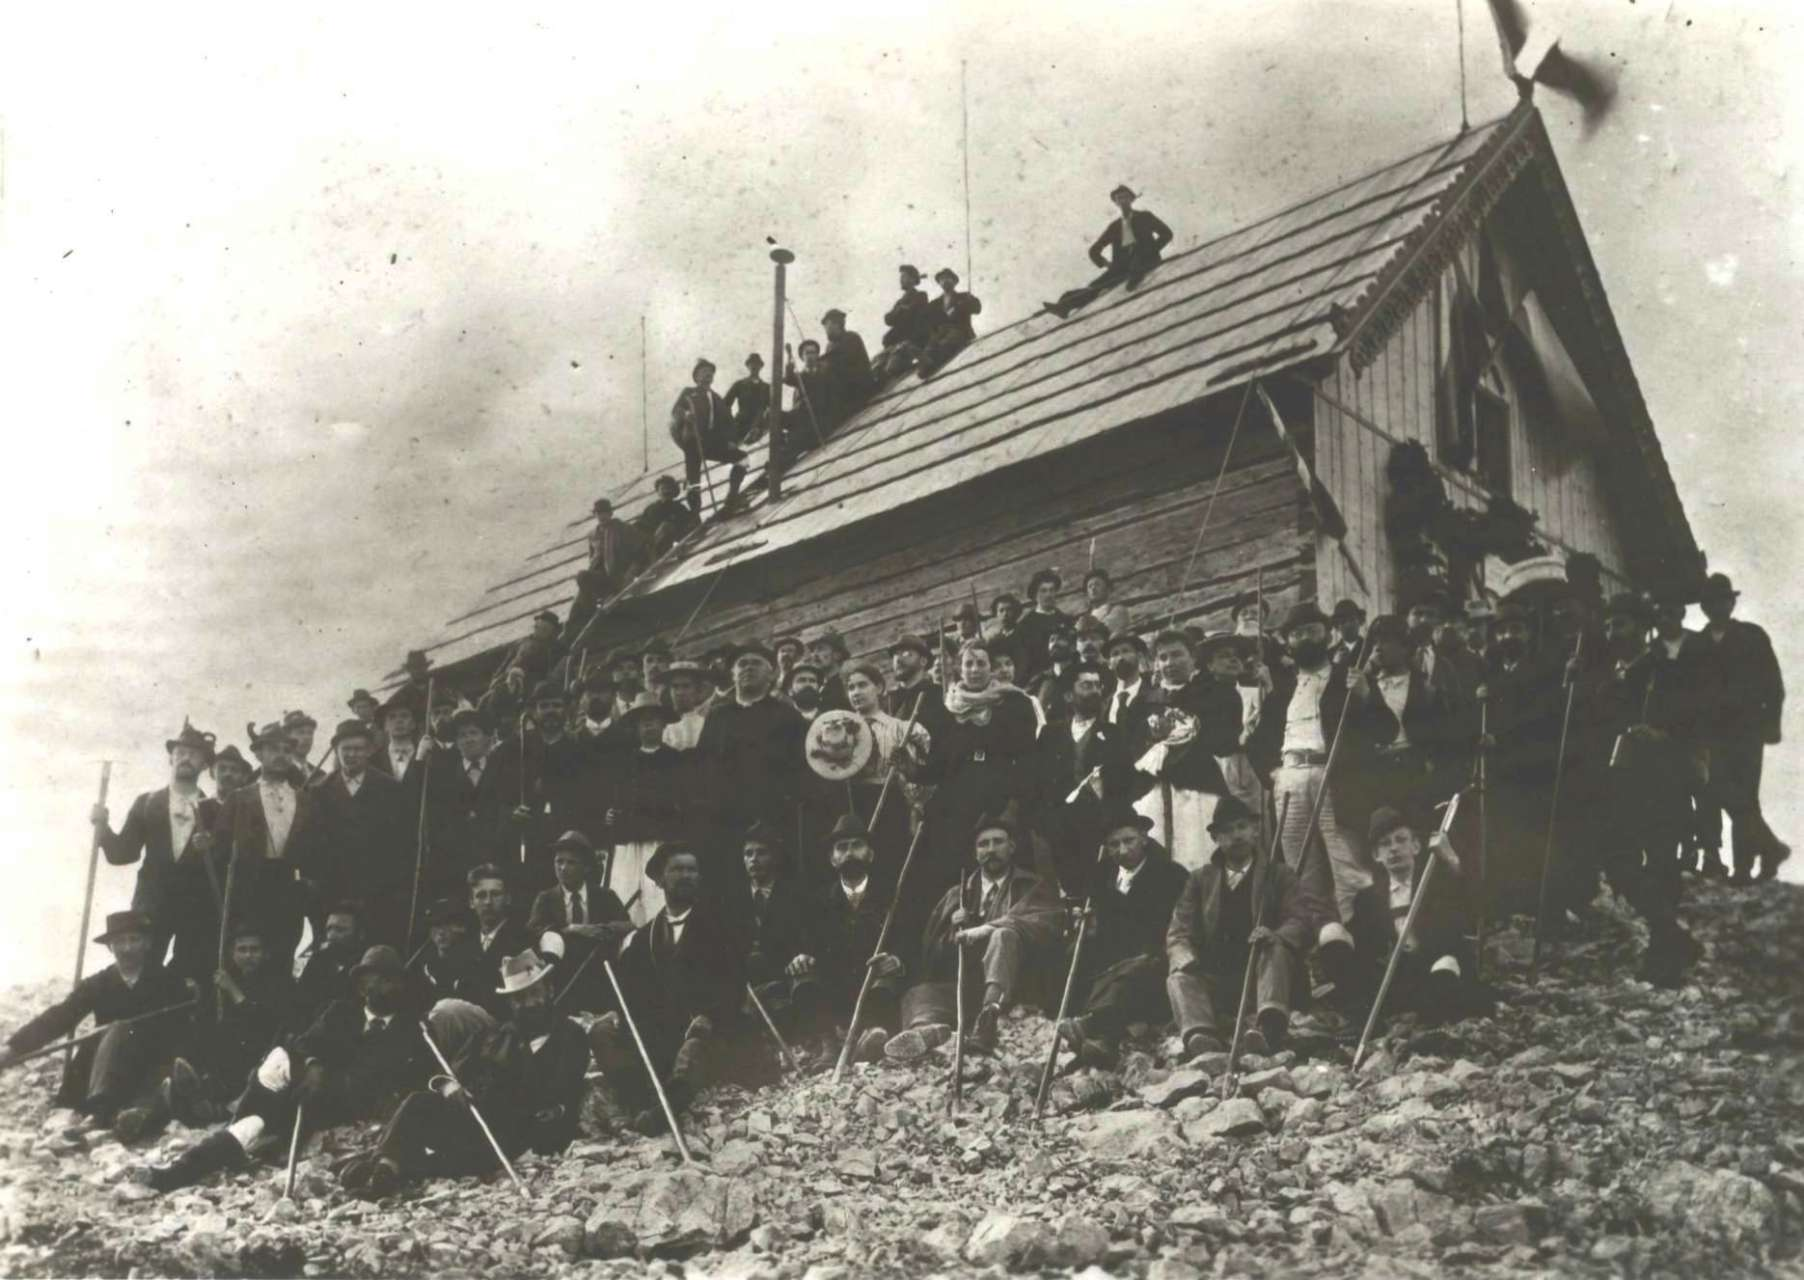 Triglav hut opening, photo by Benedikt Lergetporer